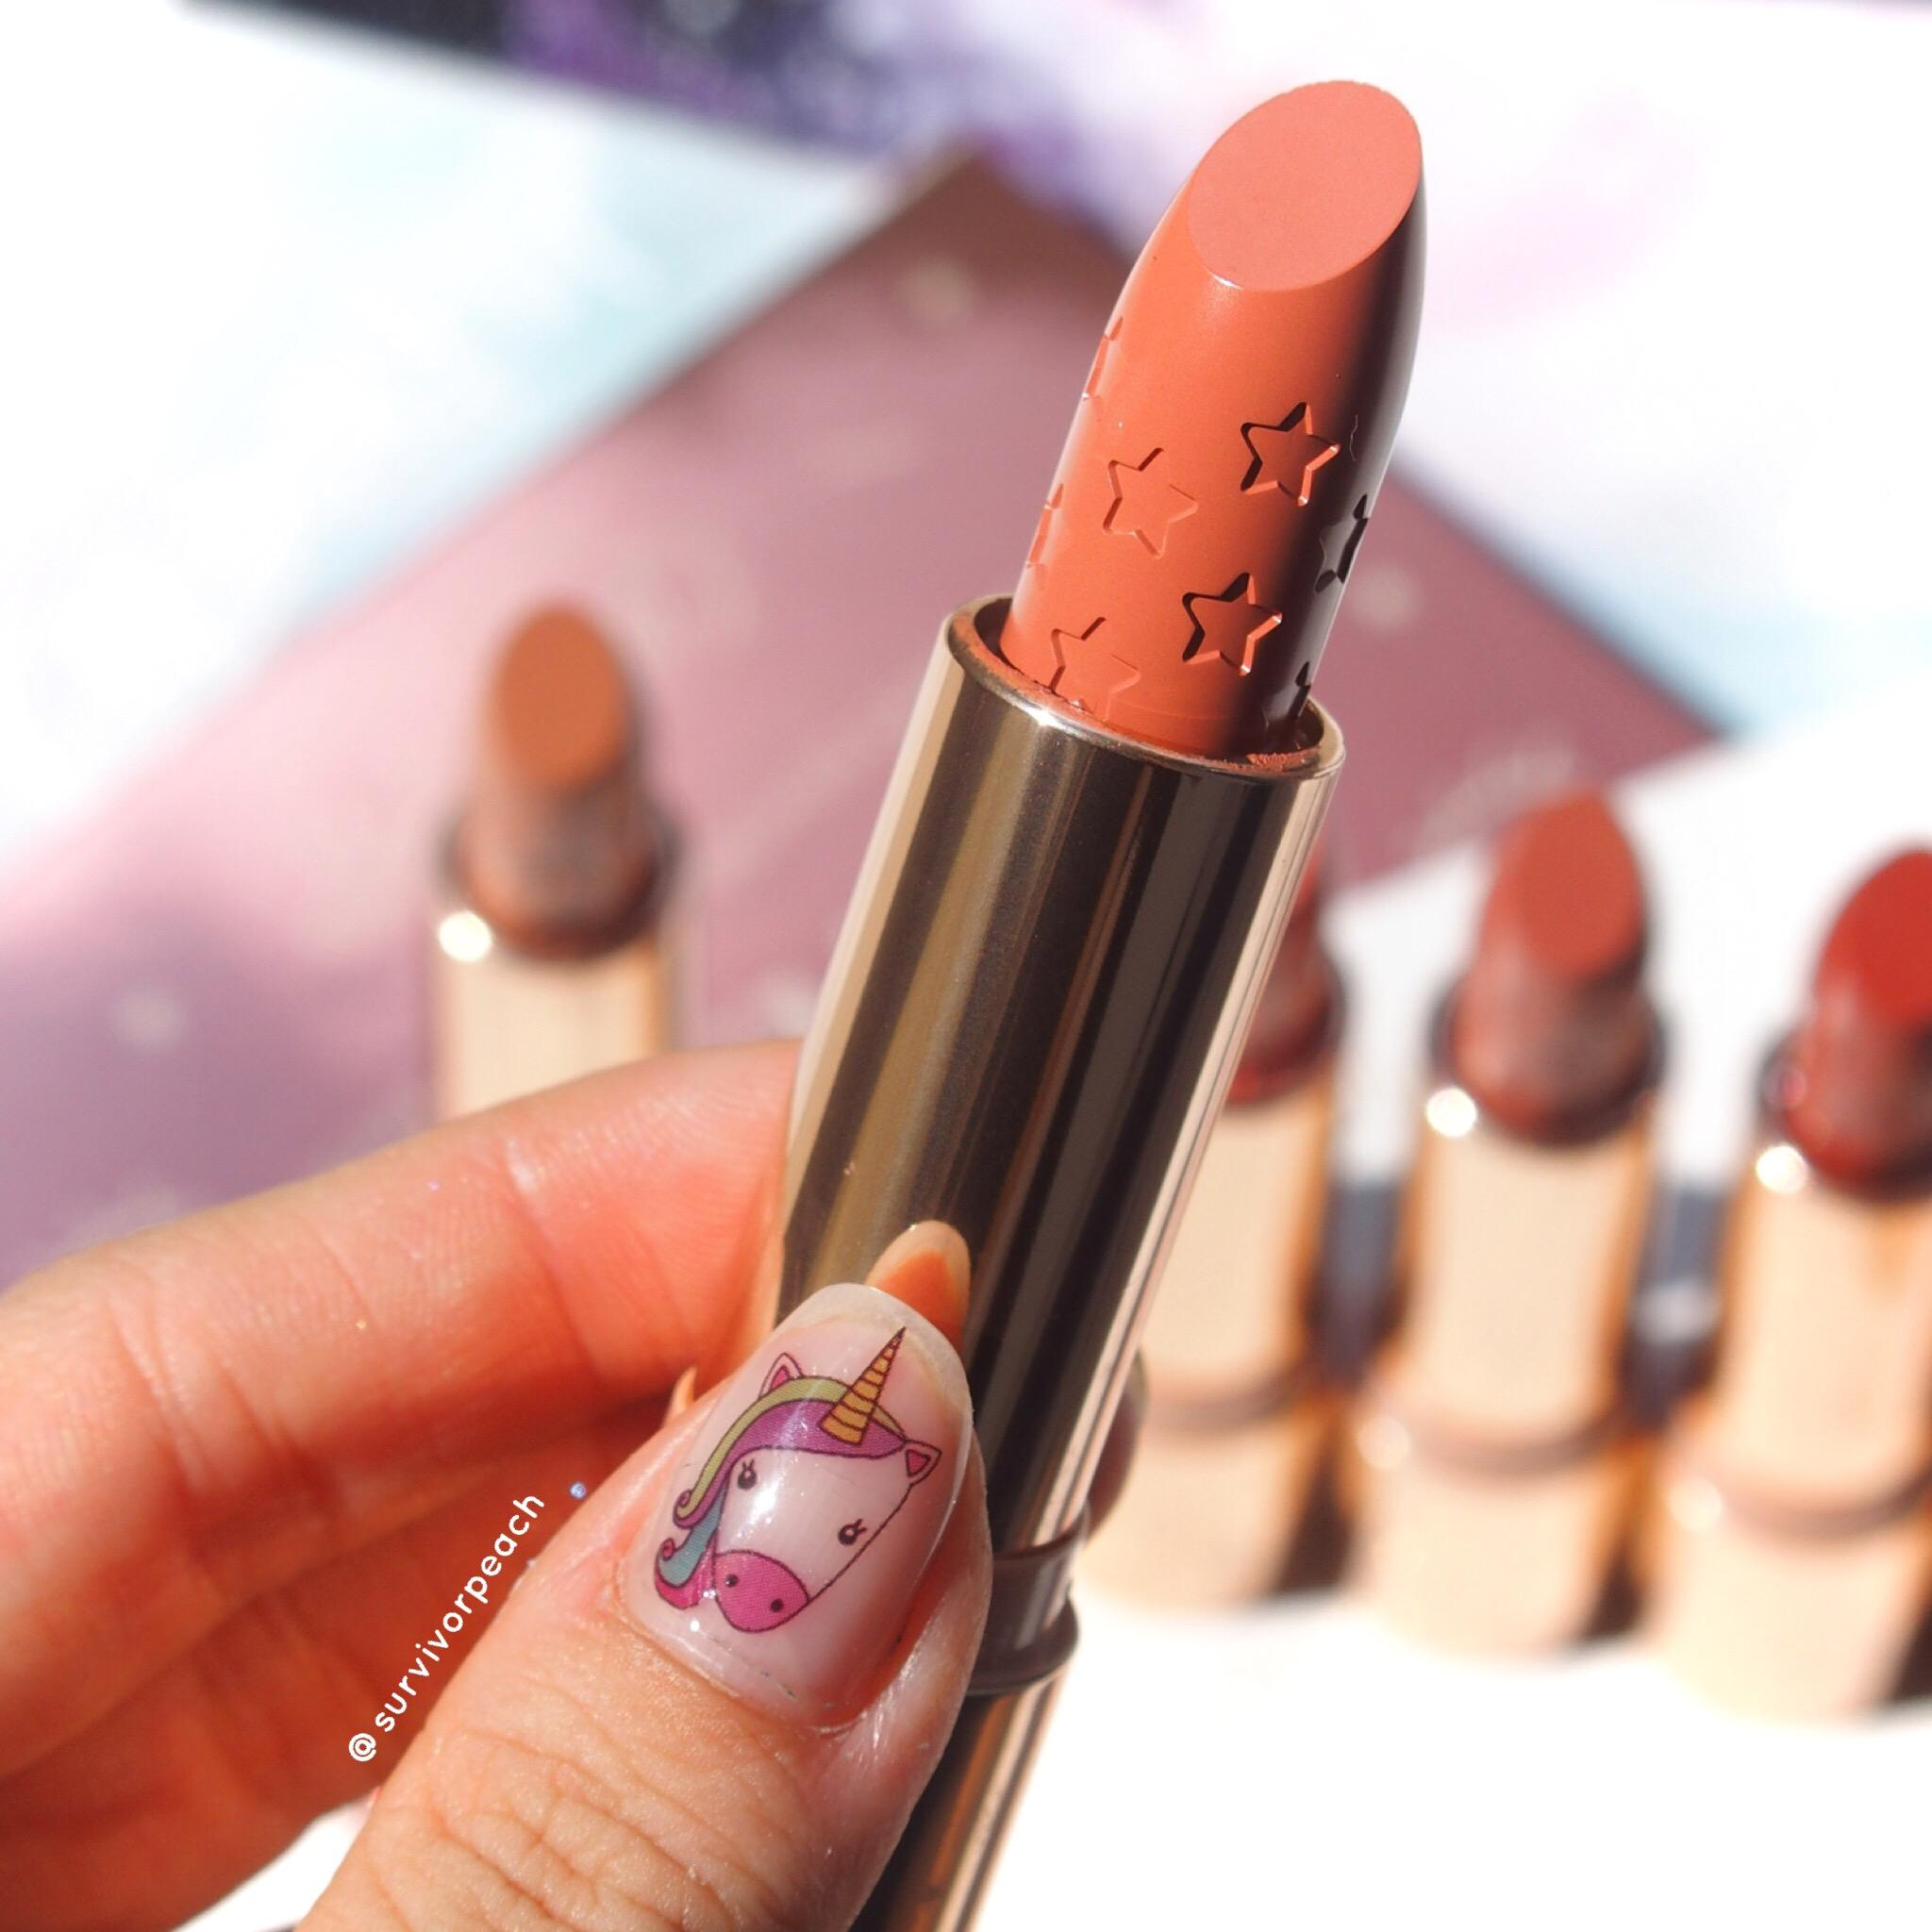 Colourpop Lux Lipsticks Appy